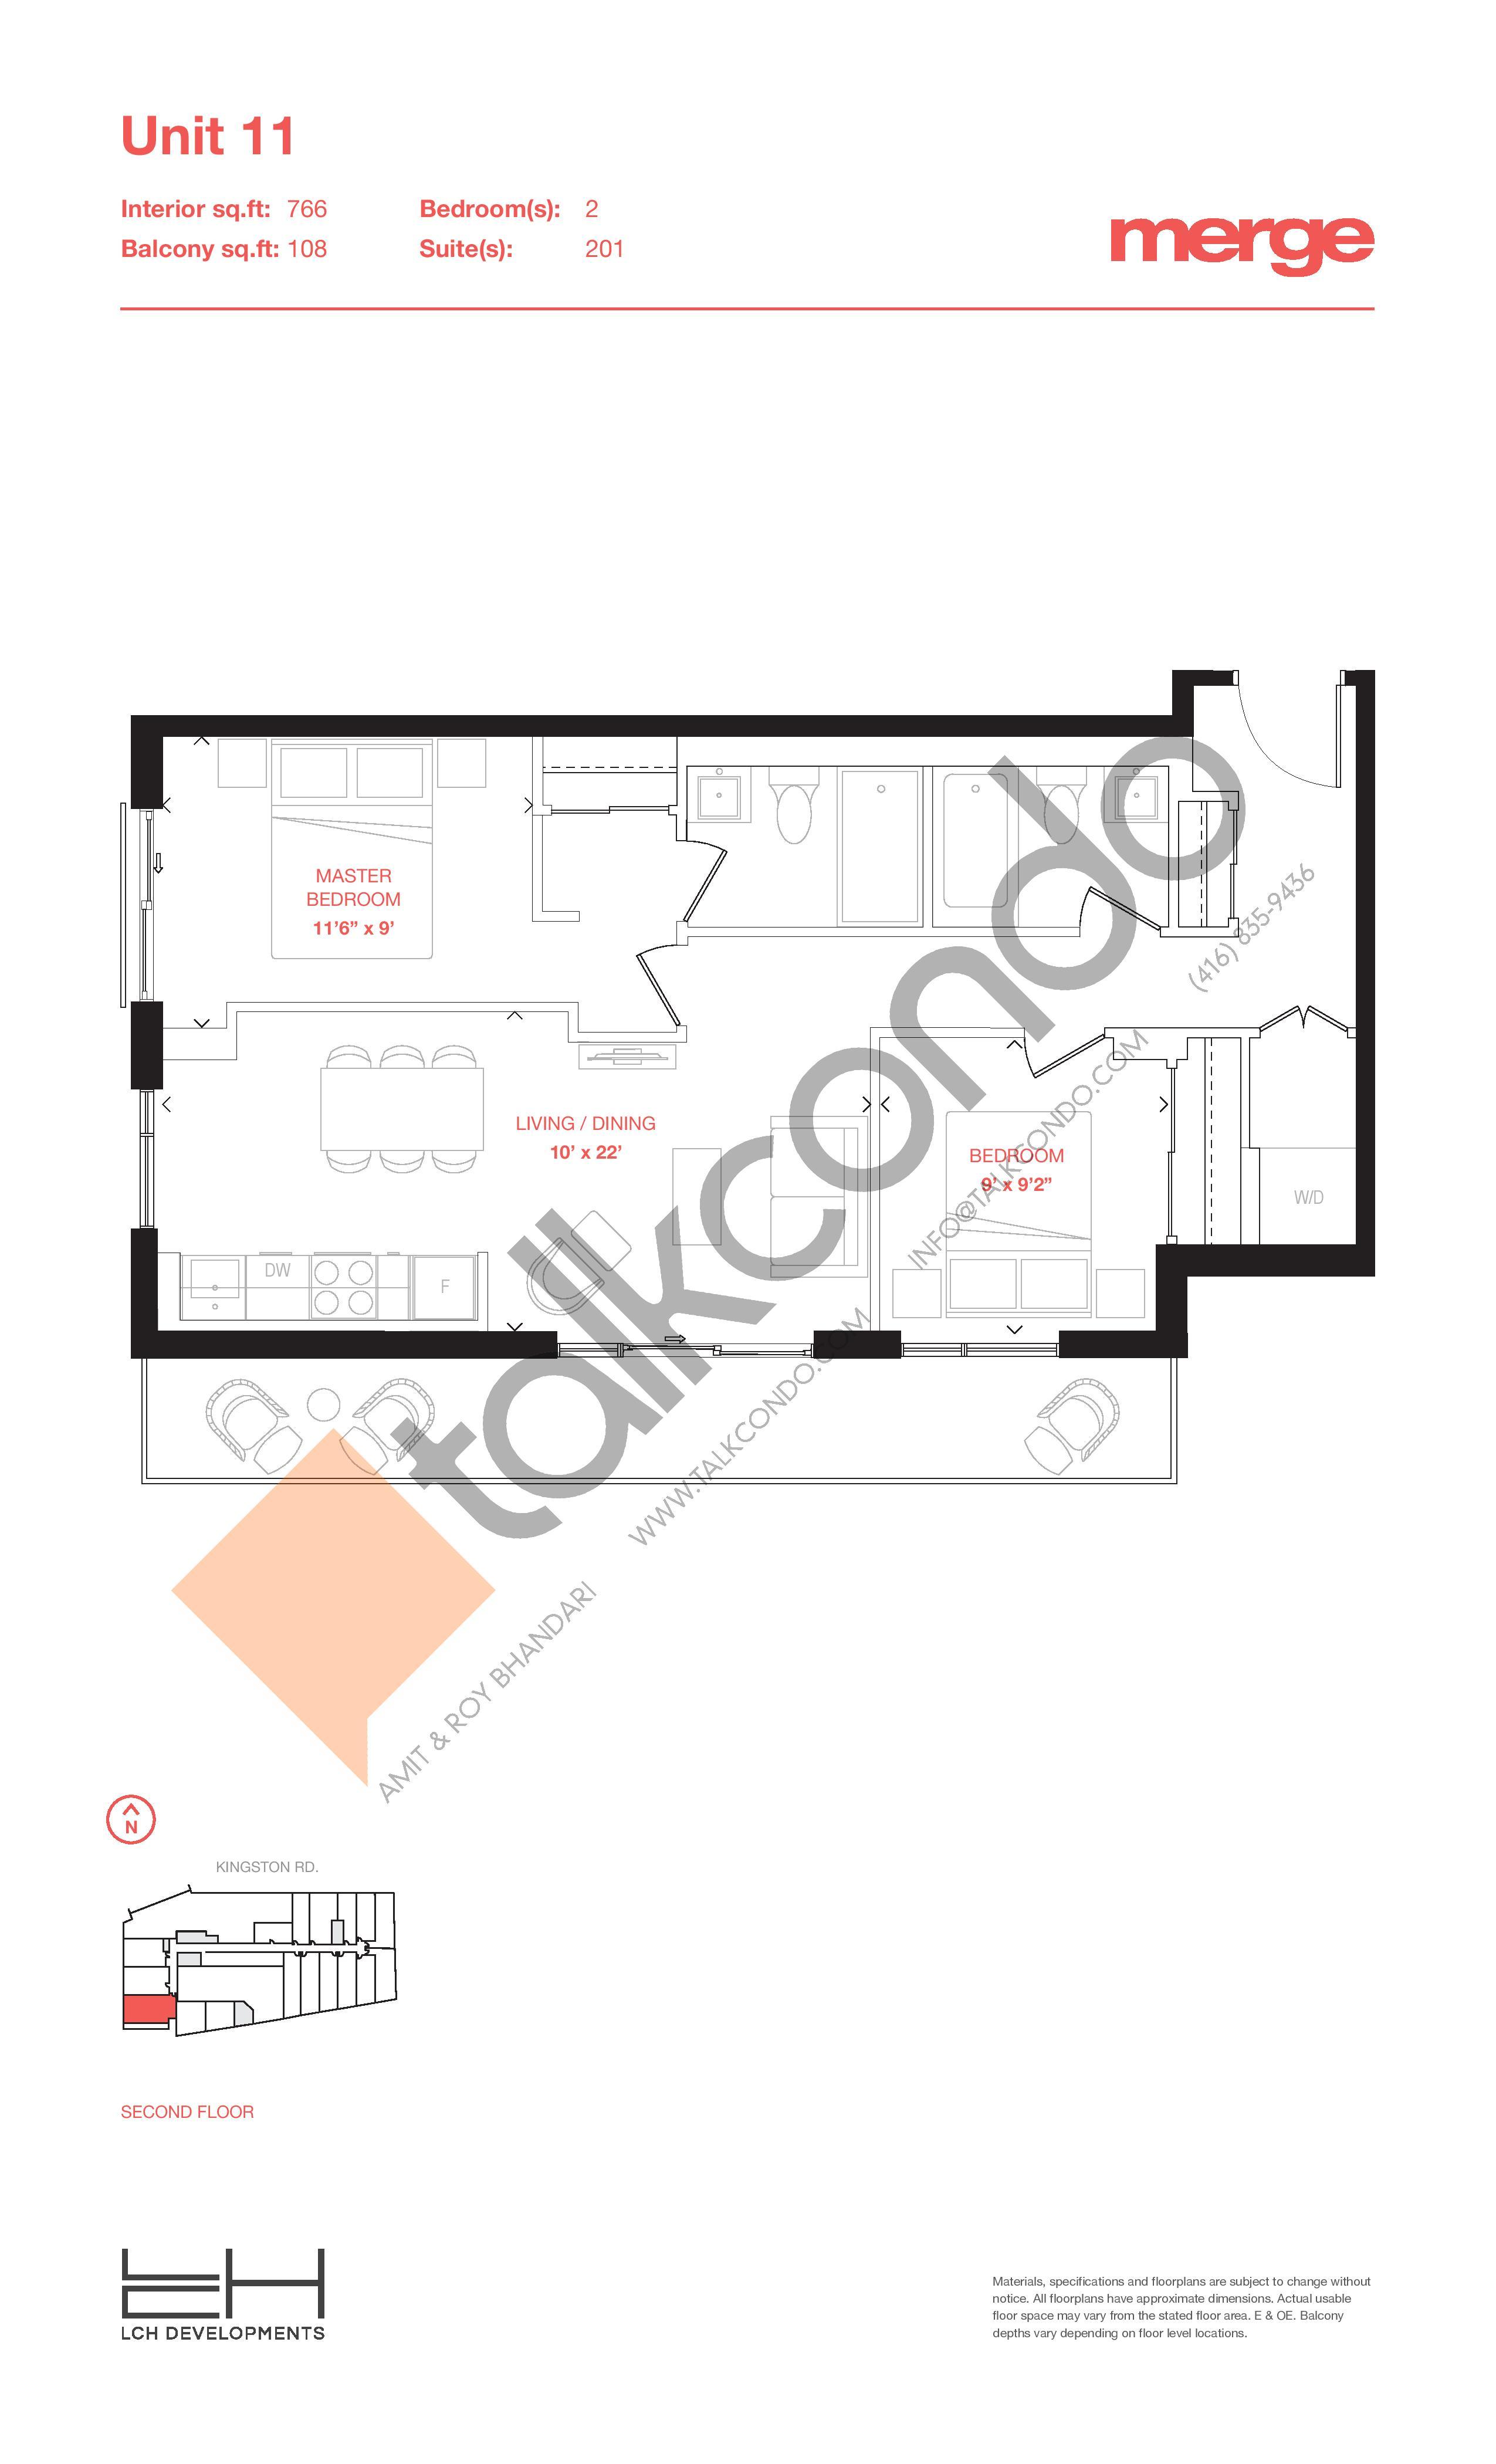 Unit 11 - Tower Floor Plan at Merge Condos - 766 sq.ft